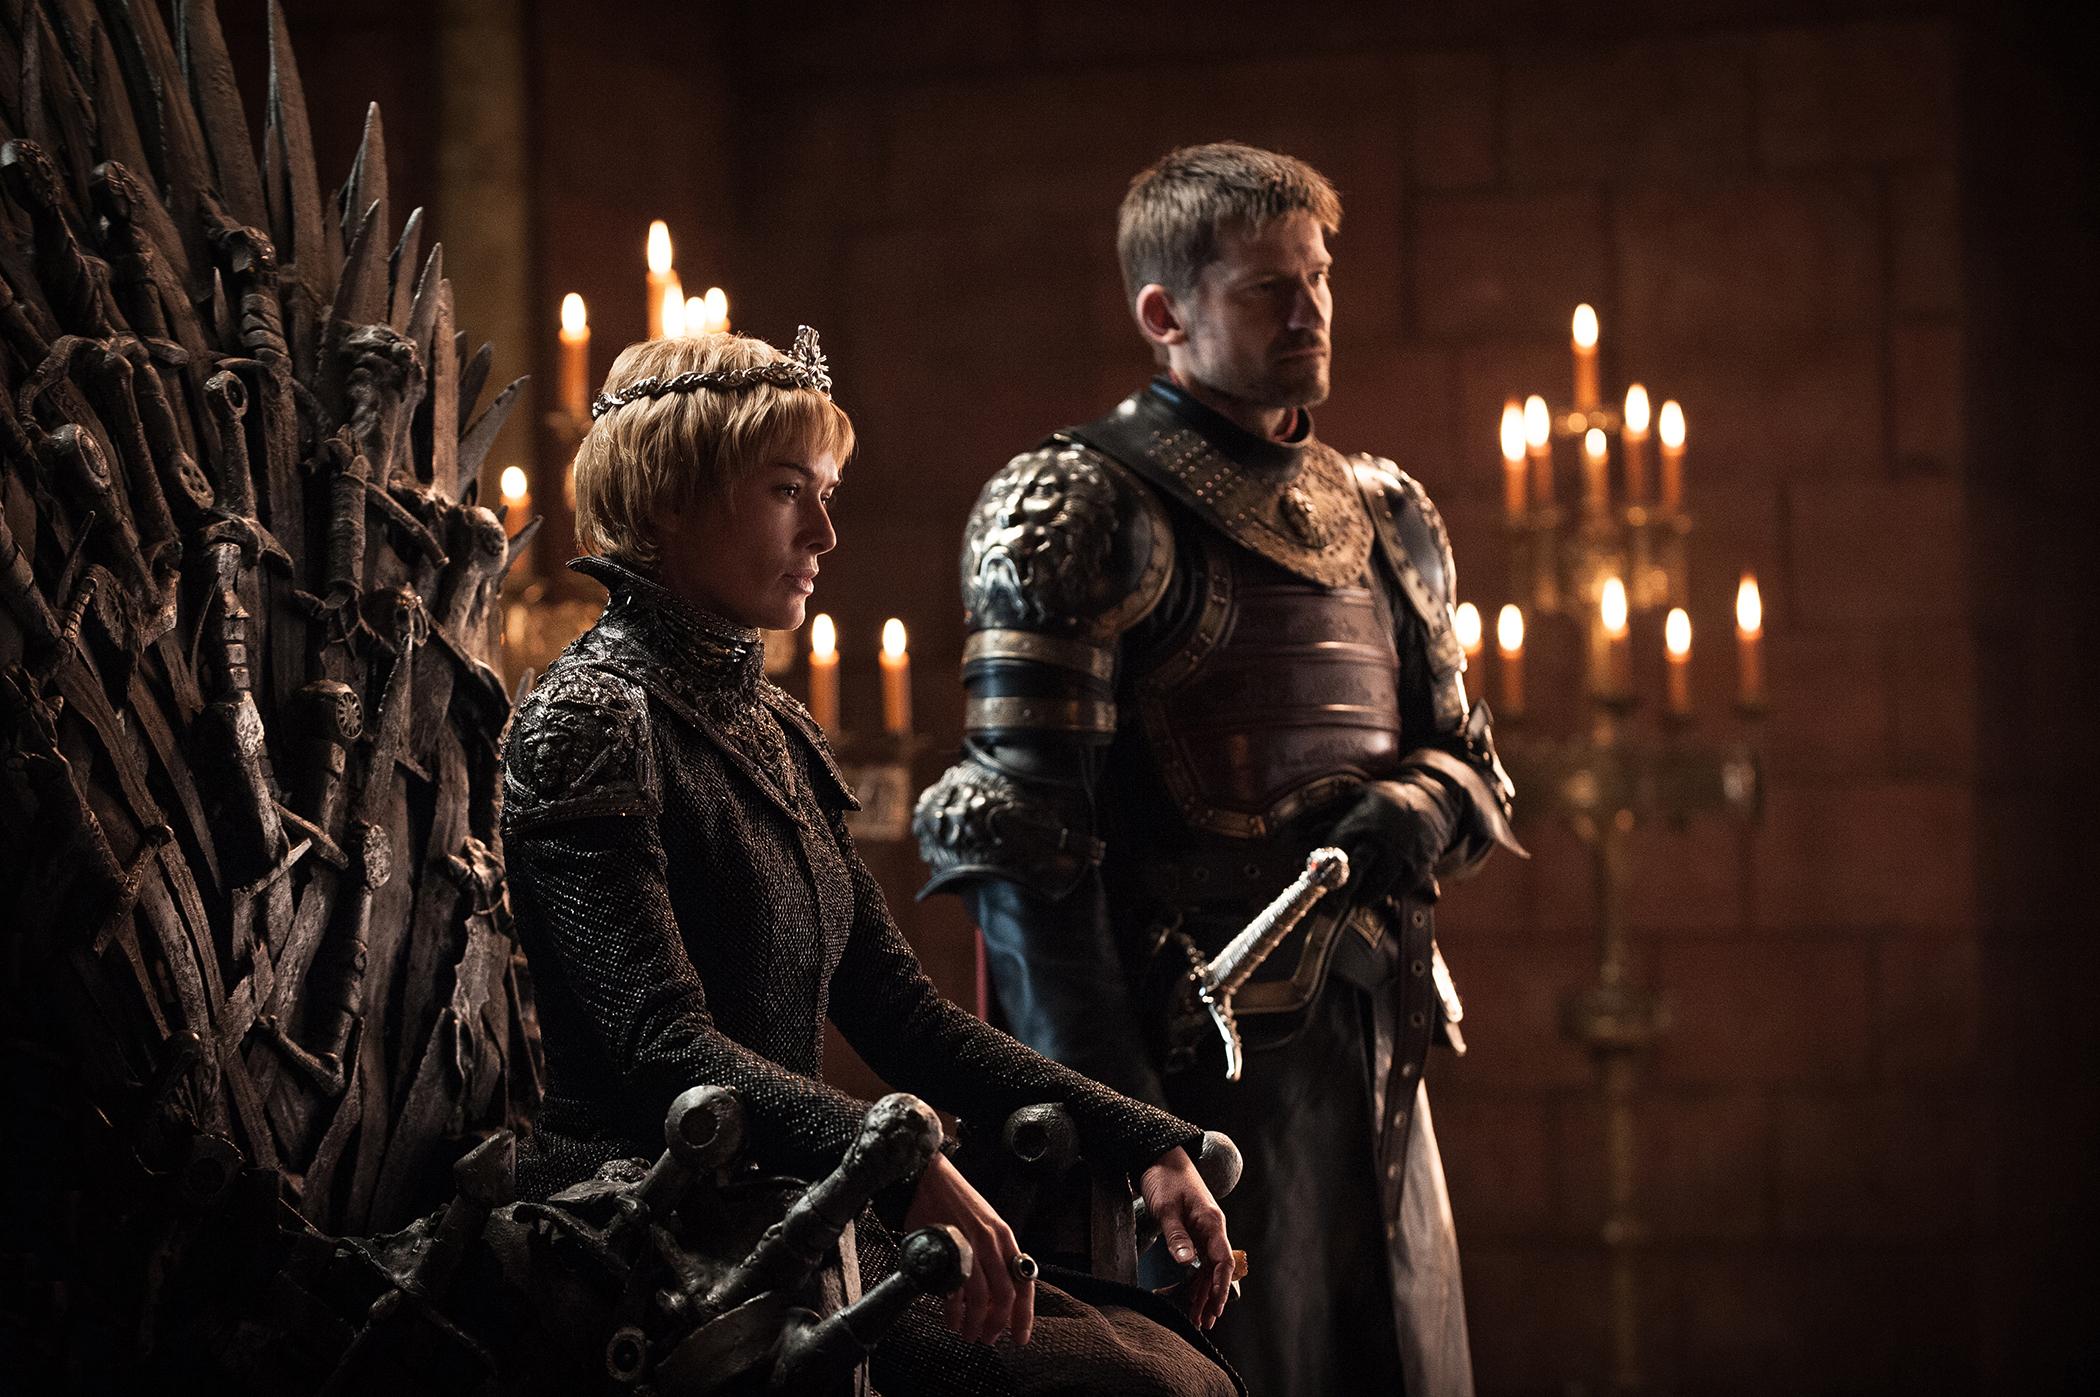 Lena Headey as Cersei Lannister and Nikolaj Coster-Waldau as Jaime Lannister in season 7 of Game of Thrones.